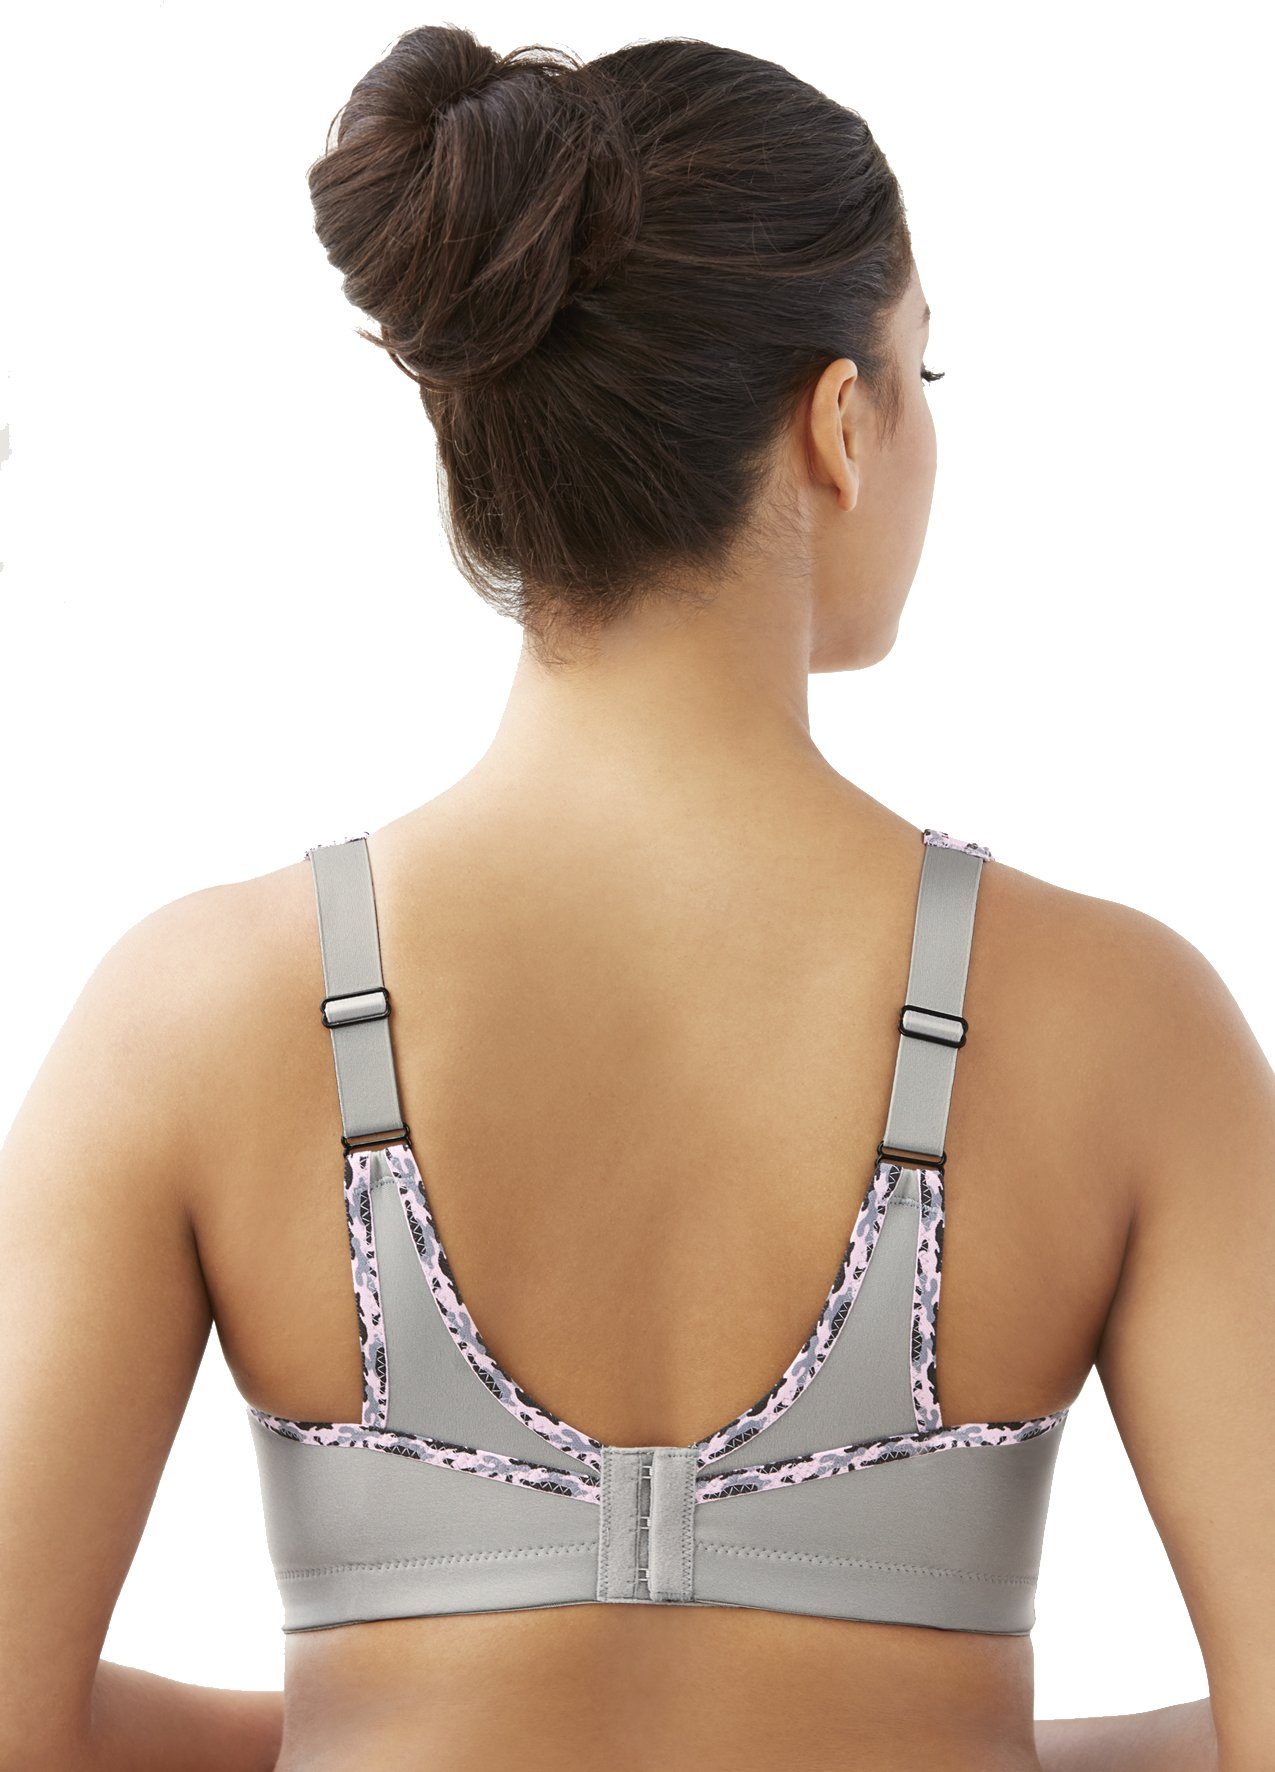 Glamorise Women's Plus-Size No-Bounce Cami Sport Bra, Soft Grey, 34F by Glamorise (Image #2)